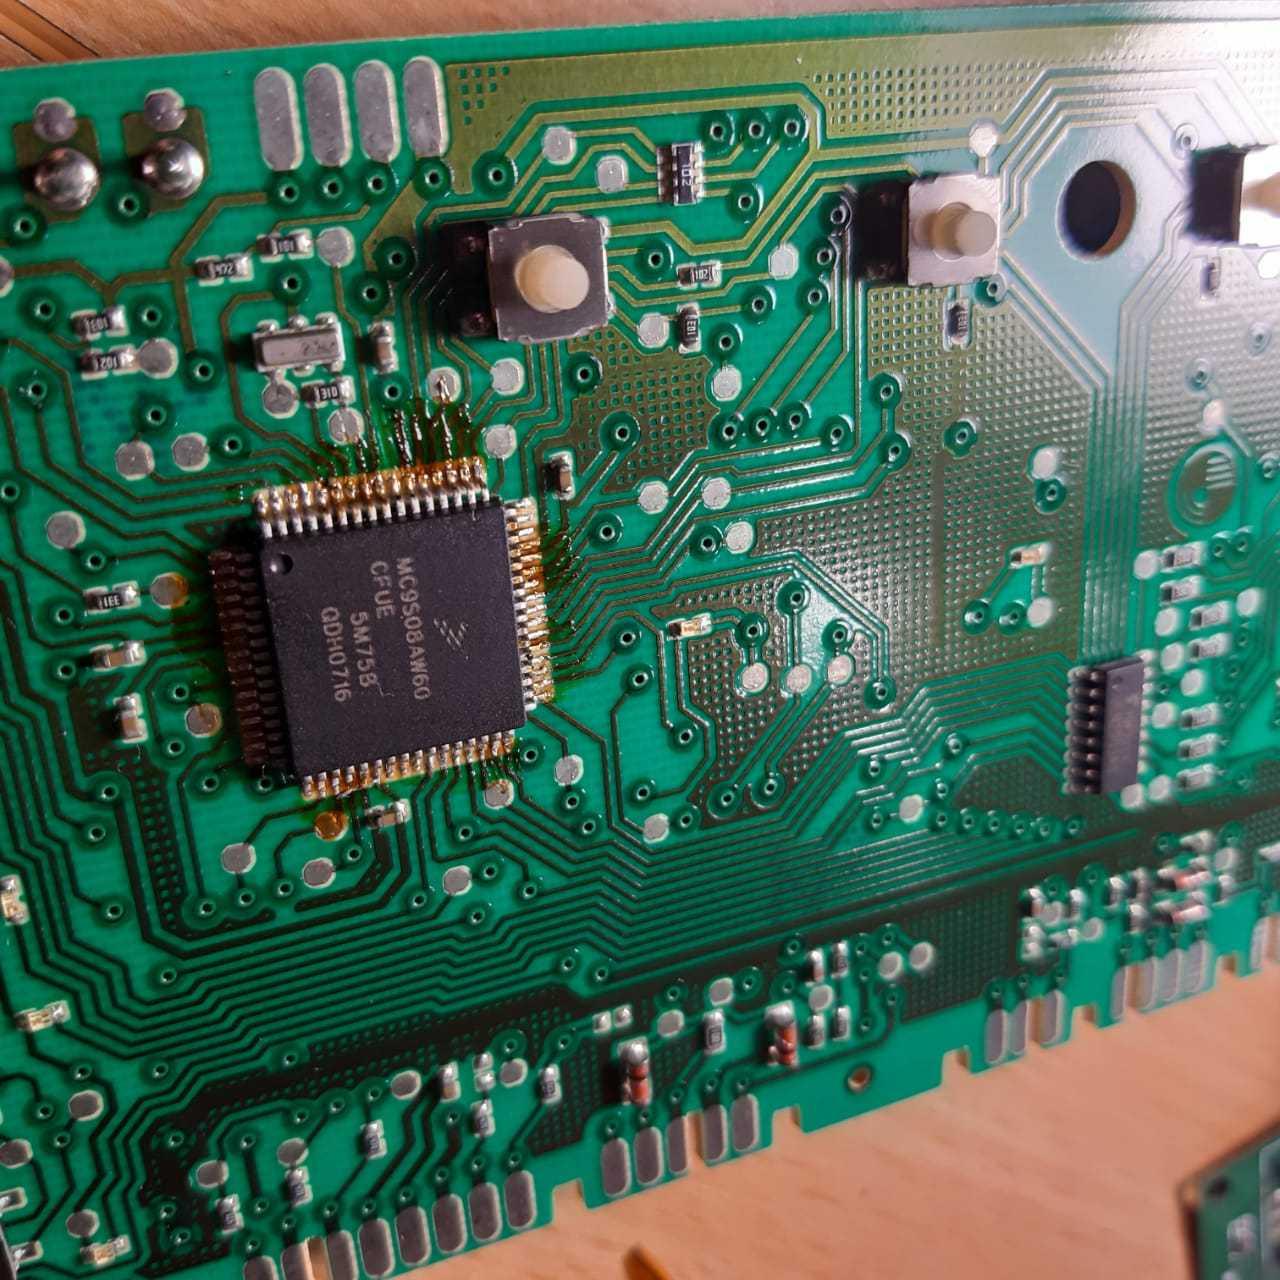 Electrolux EWG1274W необходима прошивка и конфиг